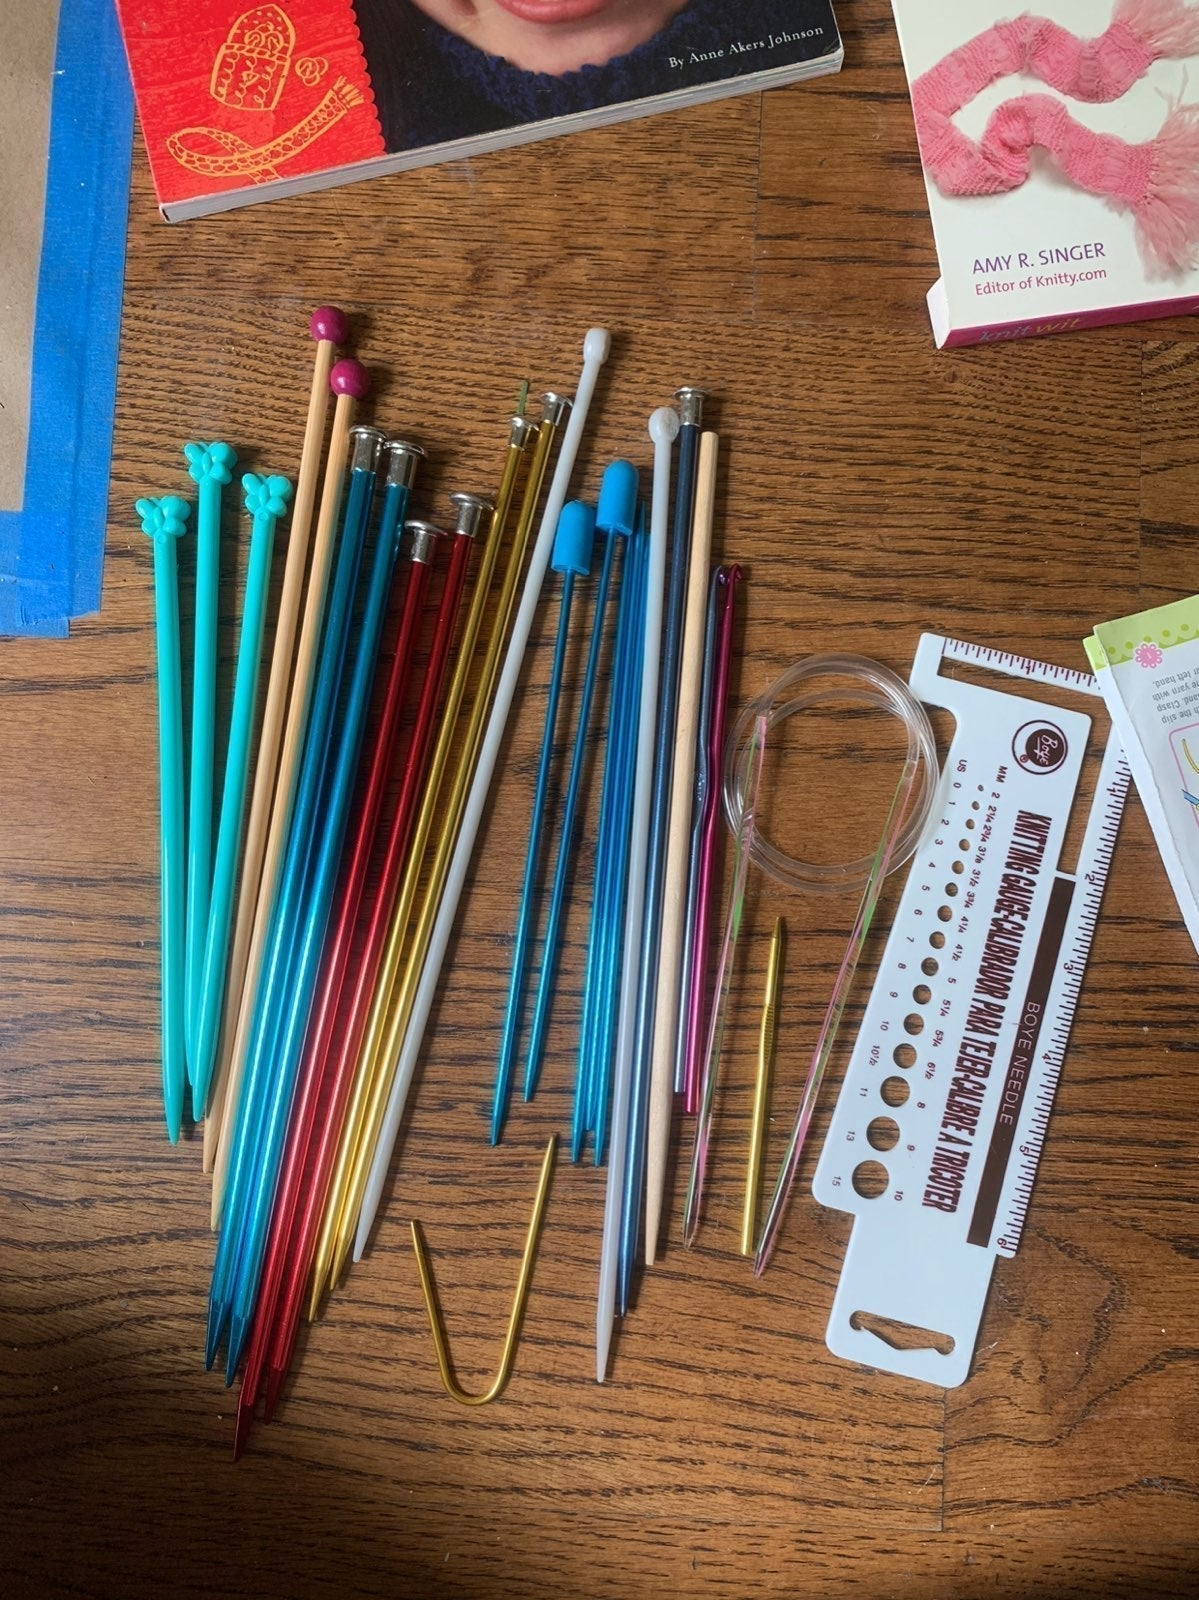 Assortment of knitting needles